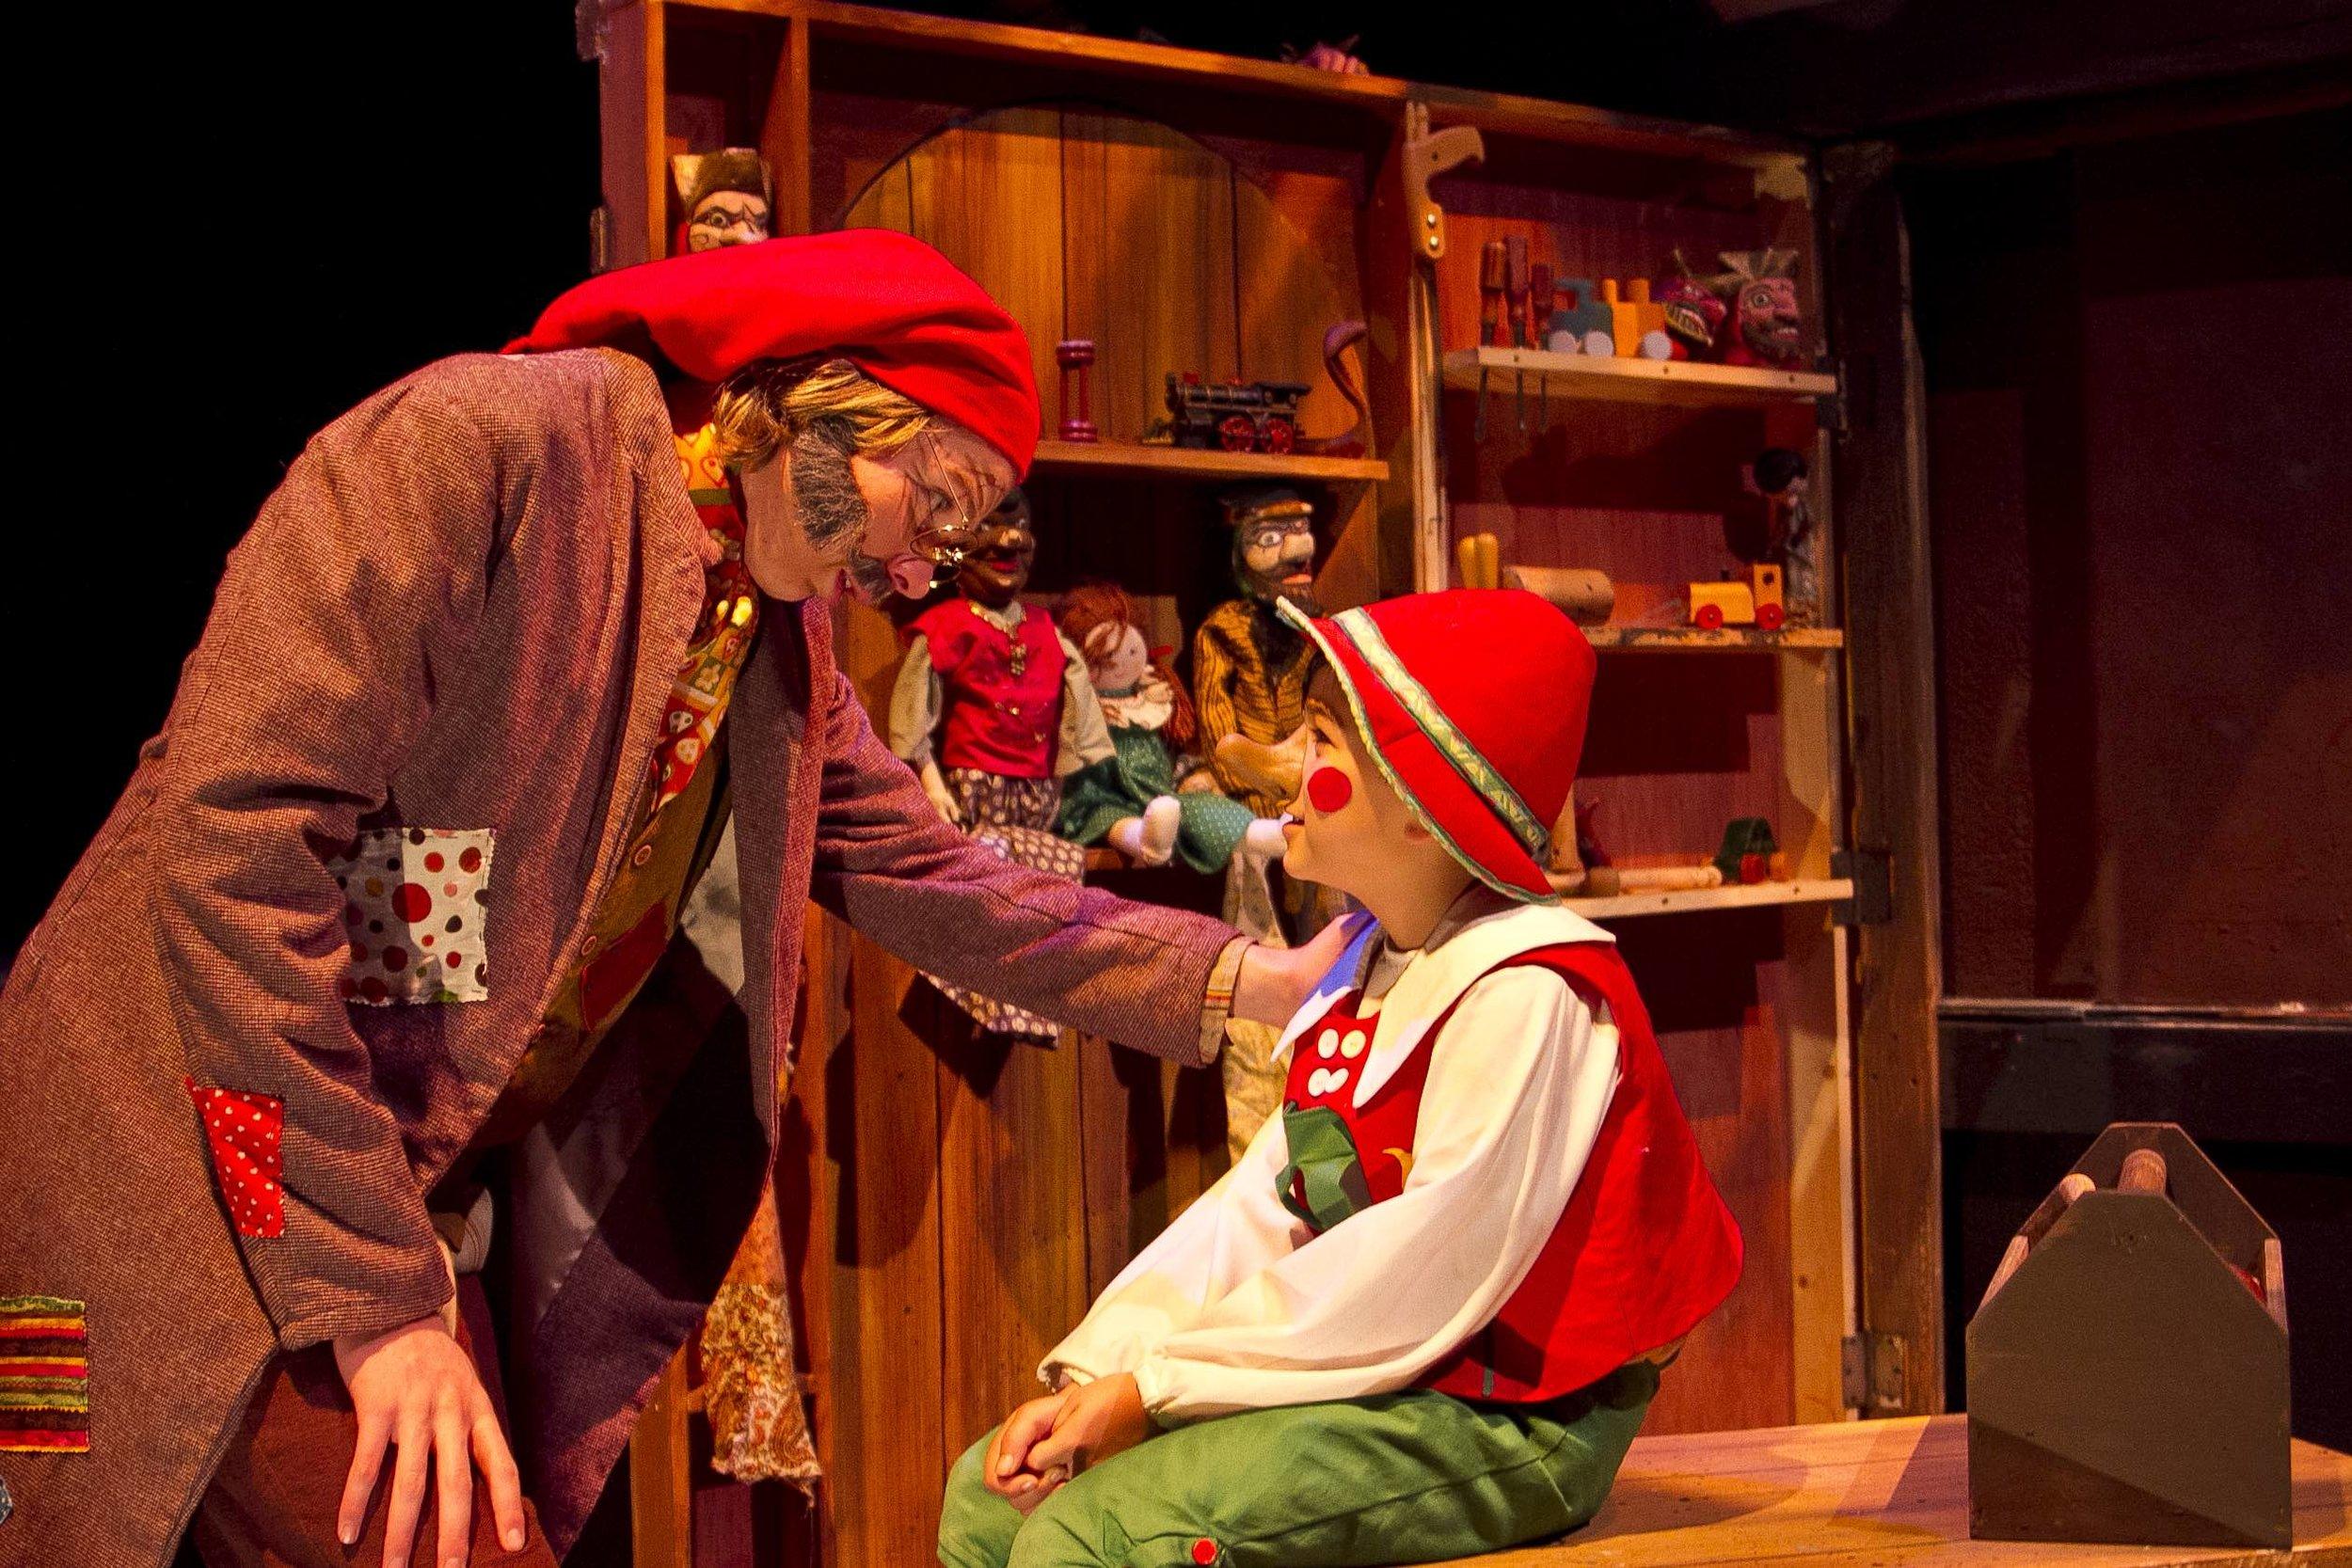 Giuseppe and Pinocchio